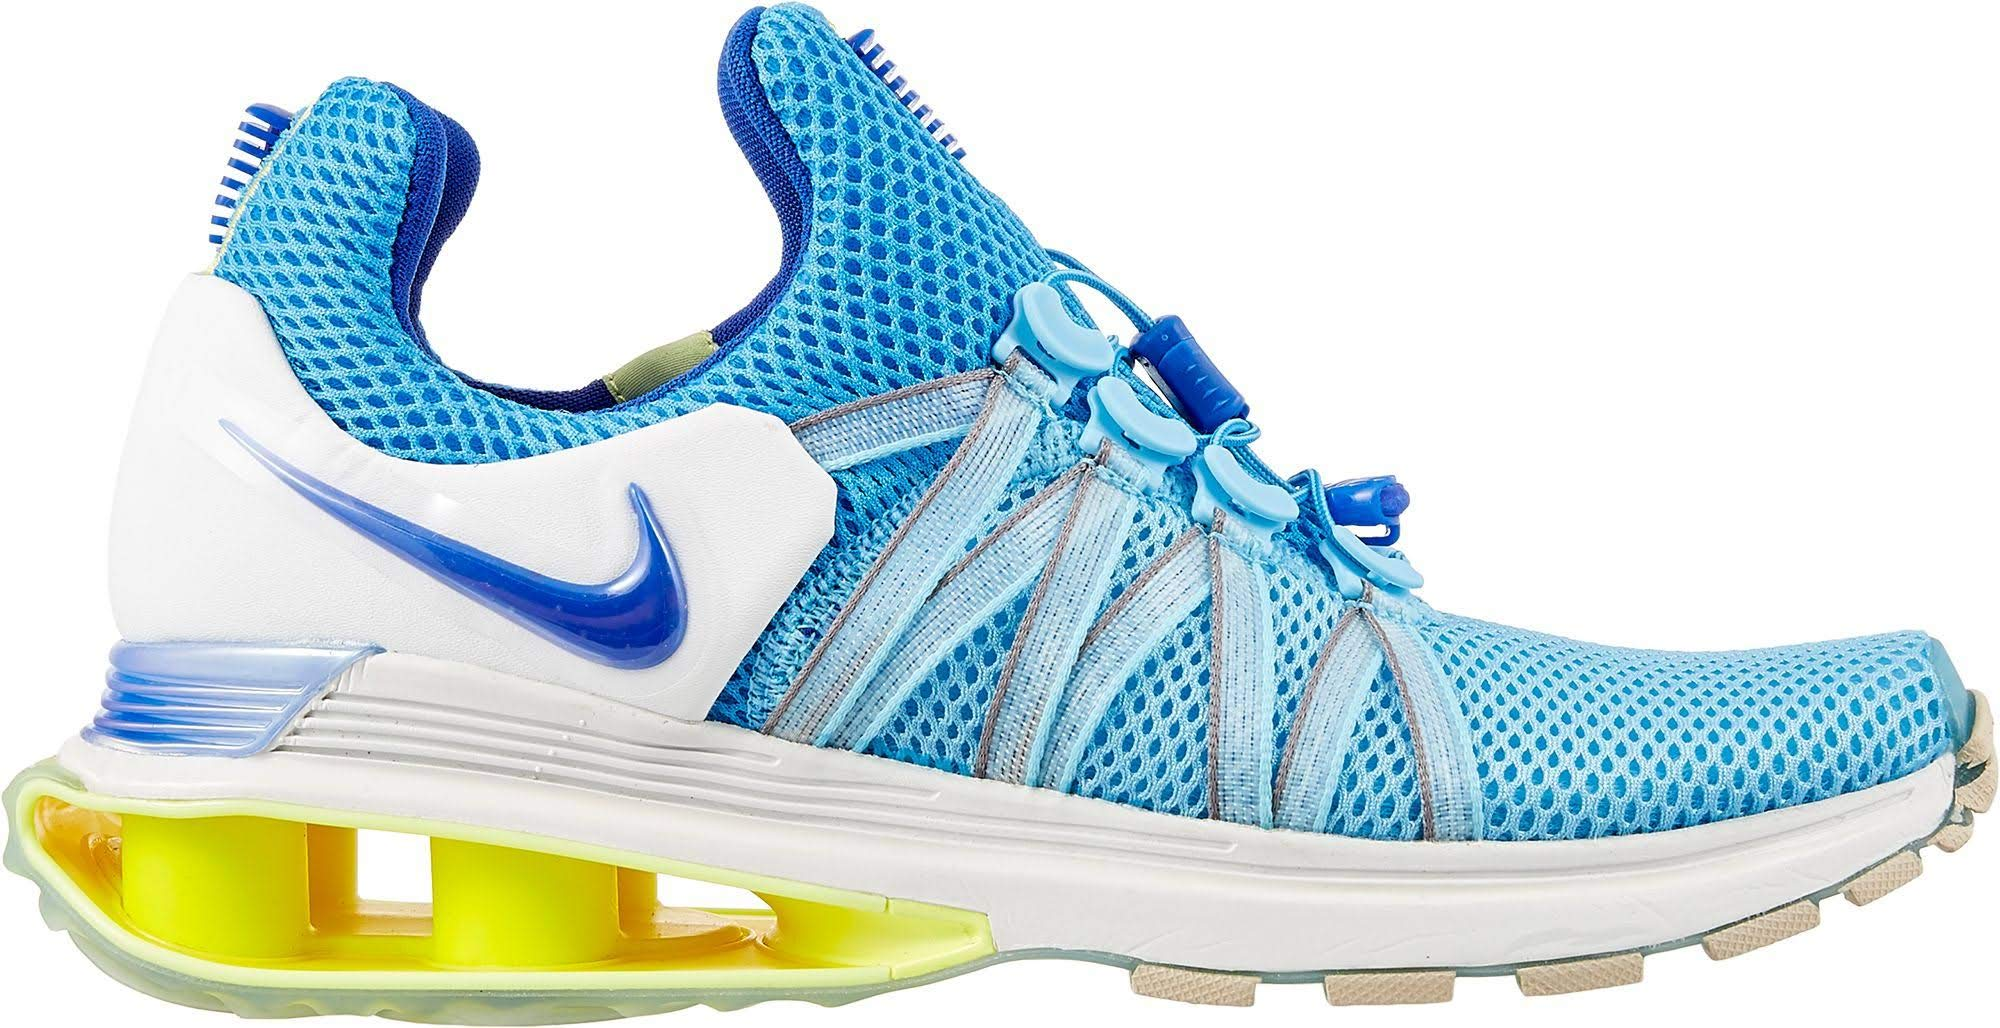 Nike Women's Shox Gravity Racer Blue Lagoon Running Training Shoes (6.5 B(M) US)